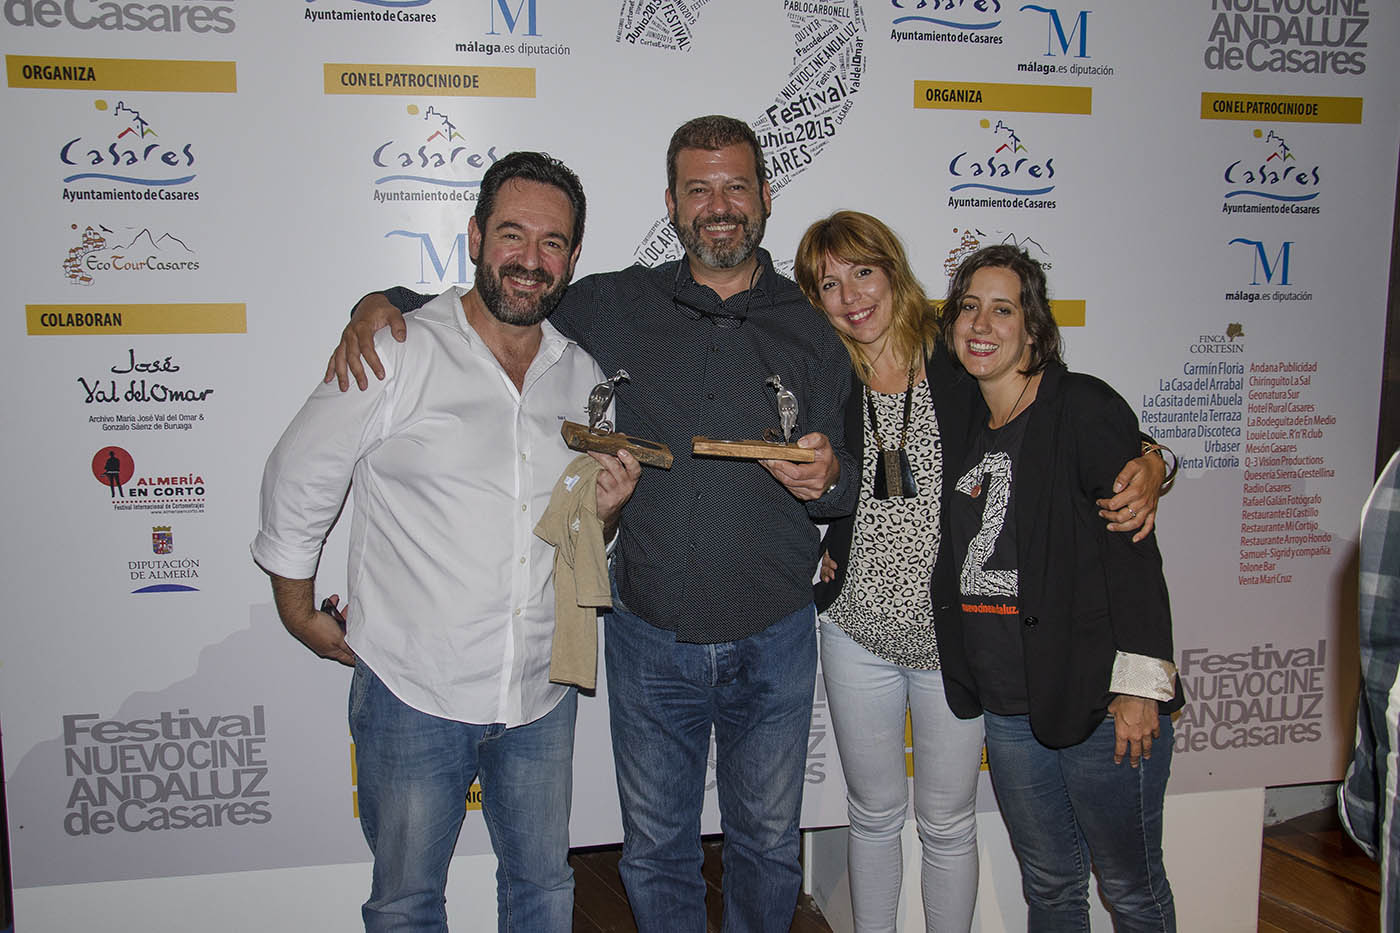 II Festival Nuevo Cine Andaluz